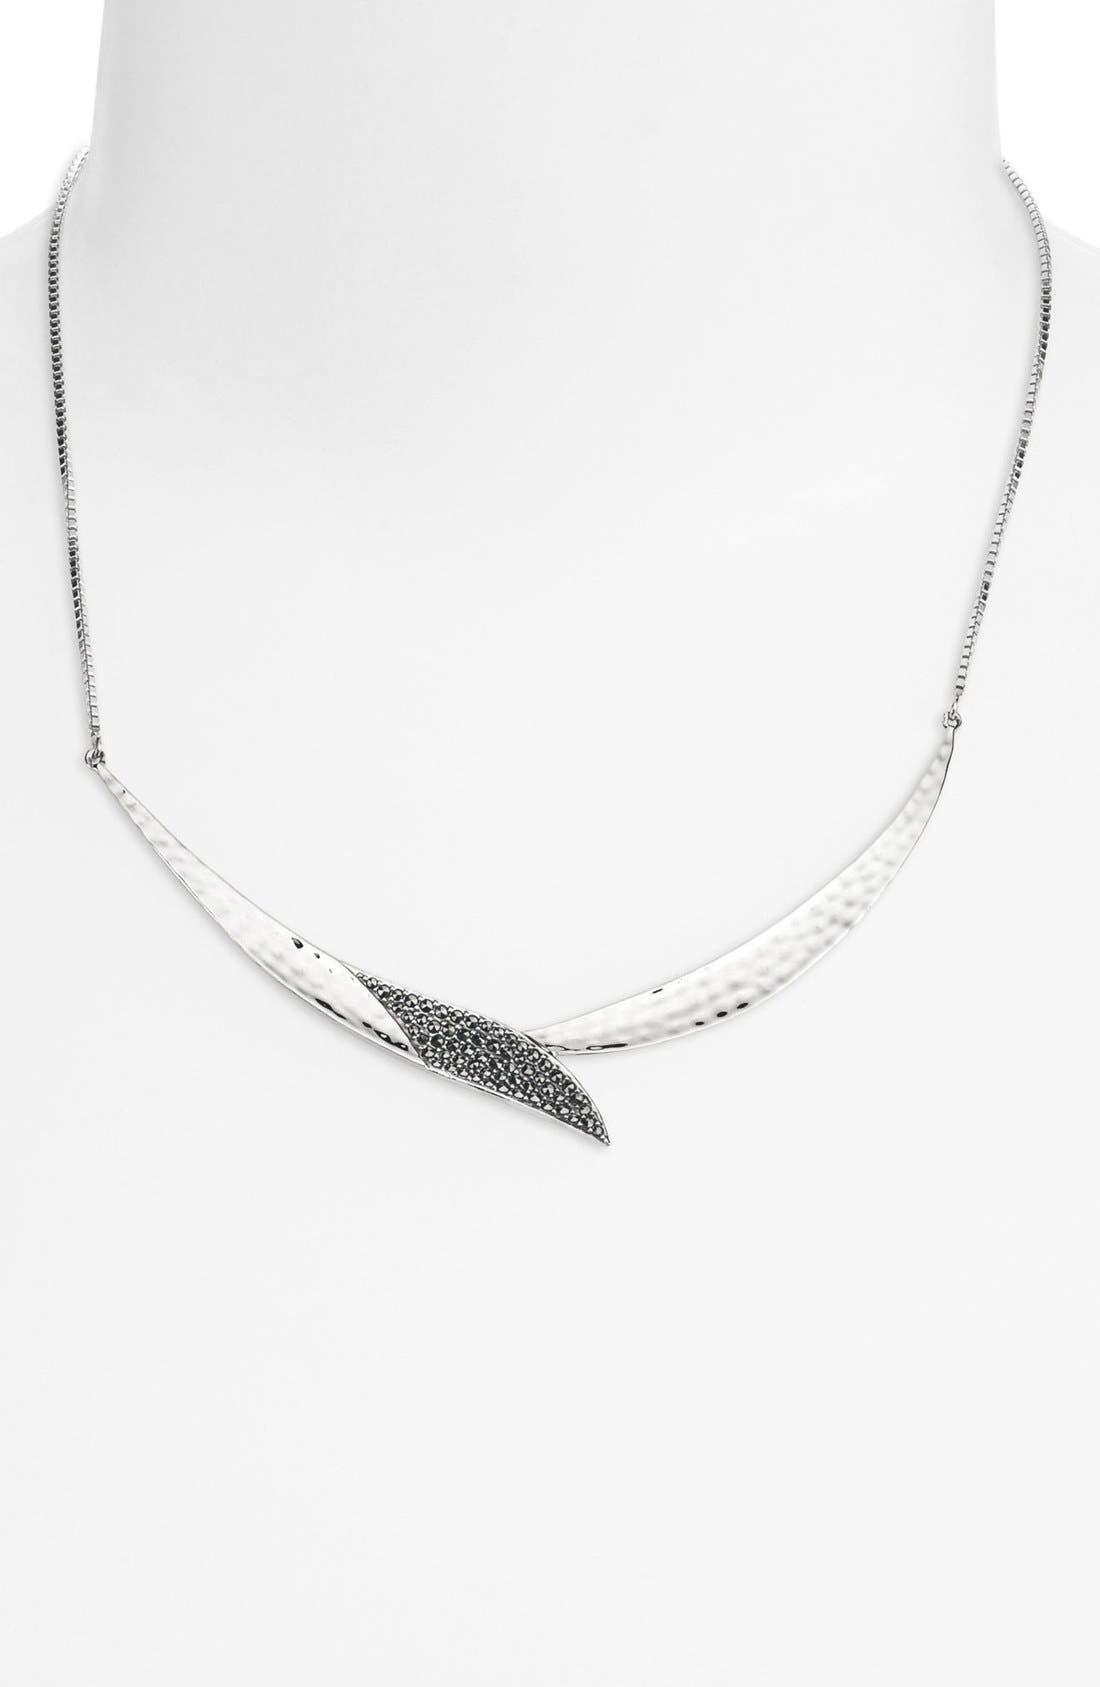 Main Image - Judith Jack 'Silver Rain' Collar Necklace (Nordstrom Exclusive)